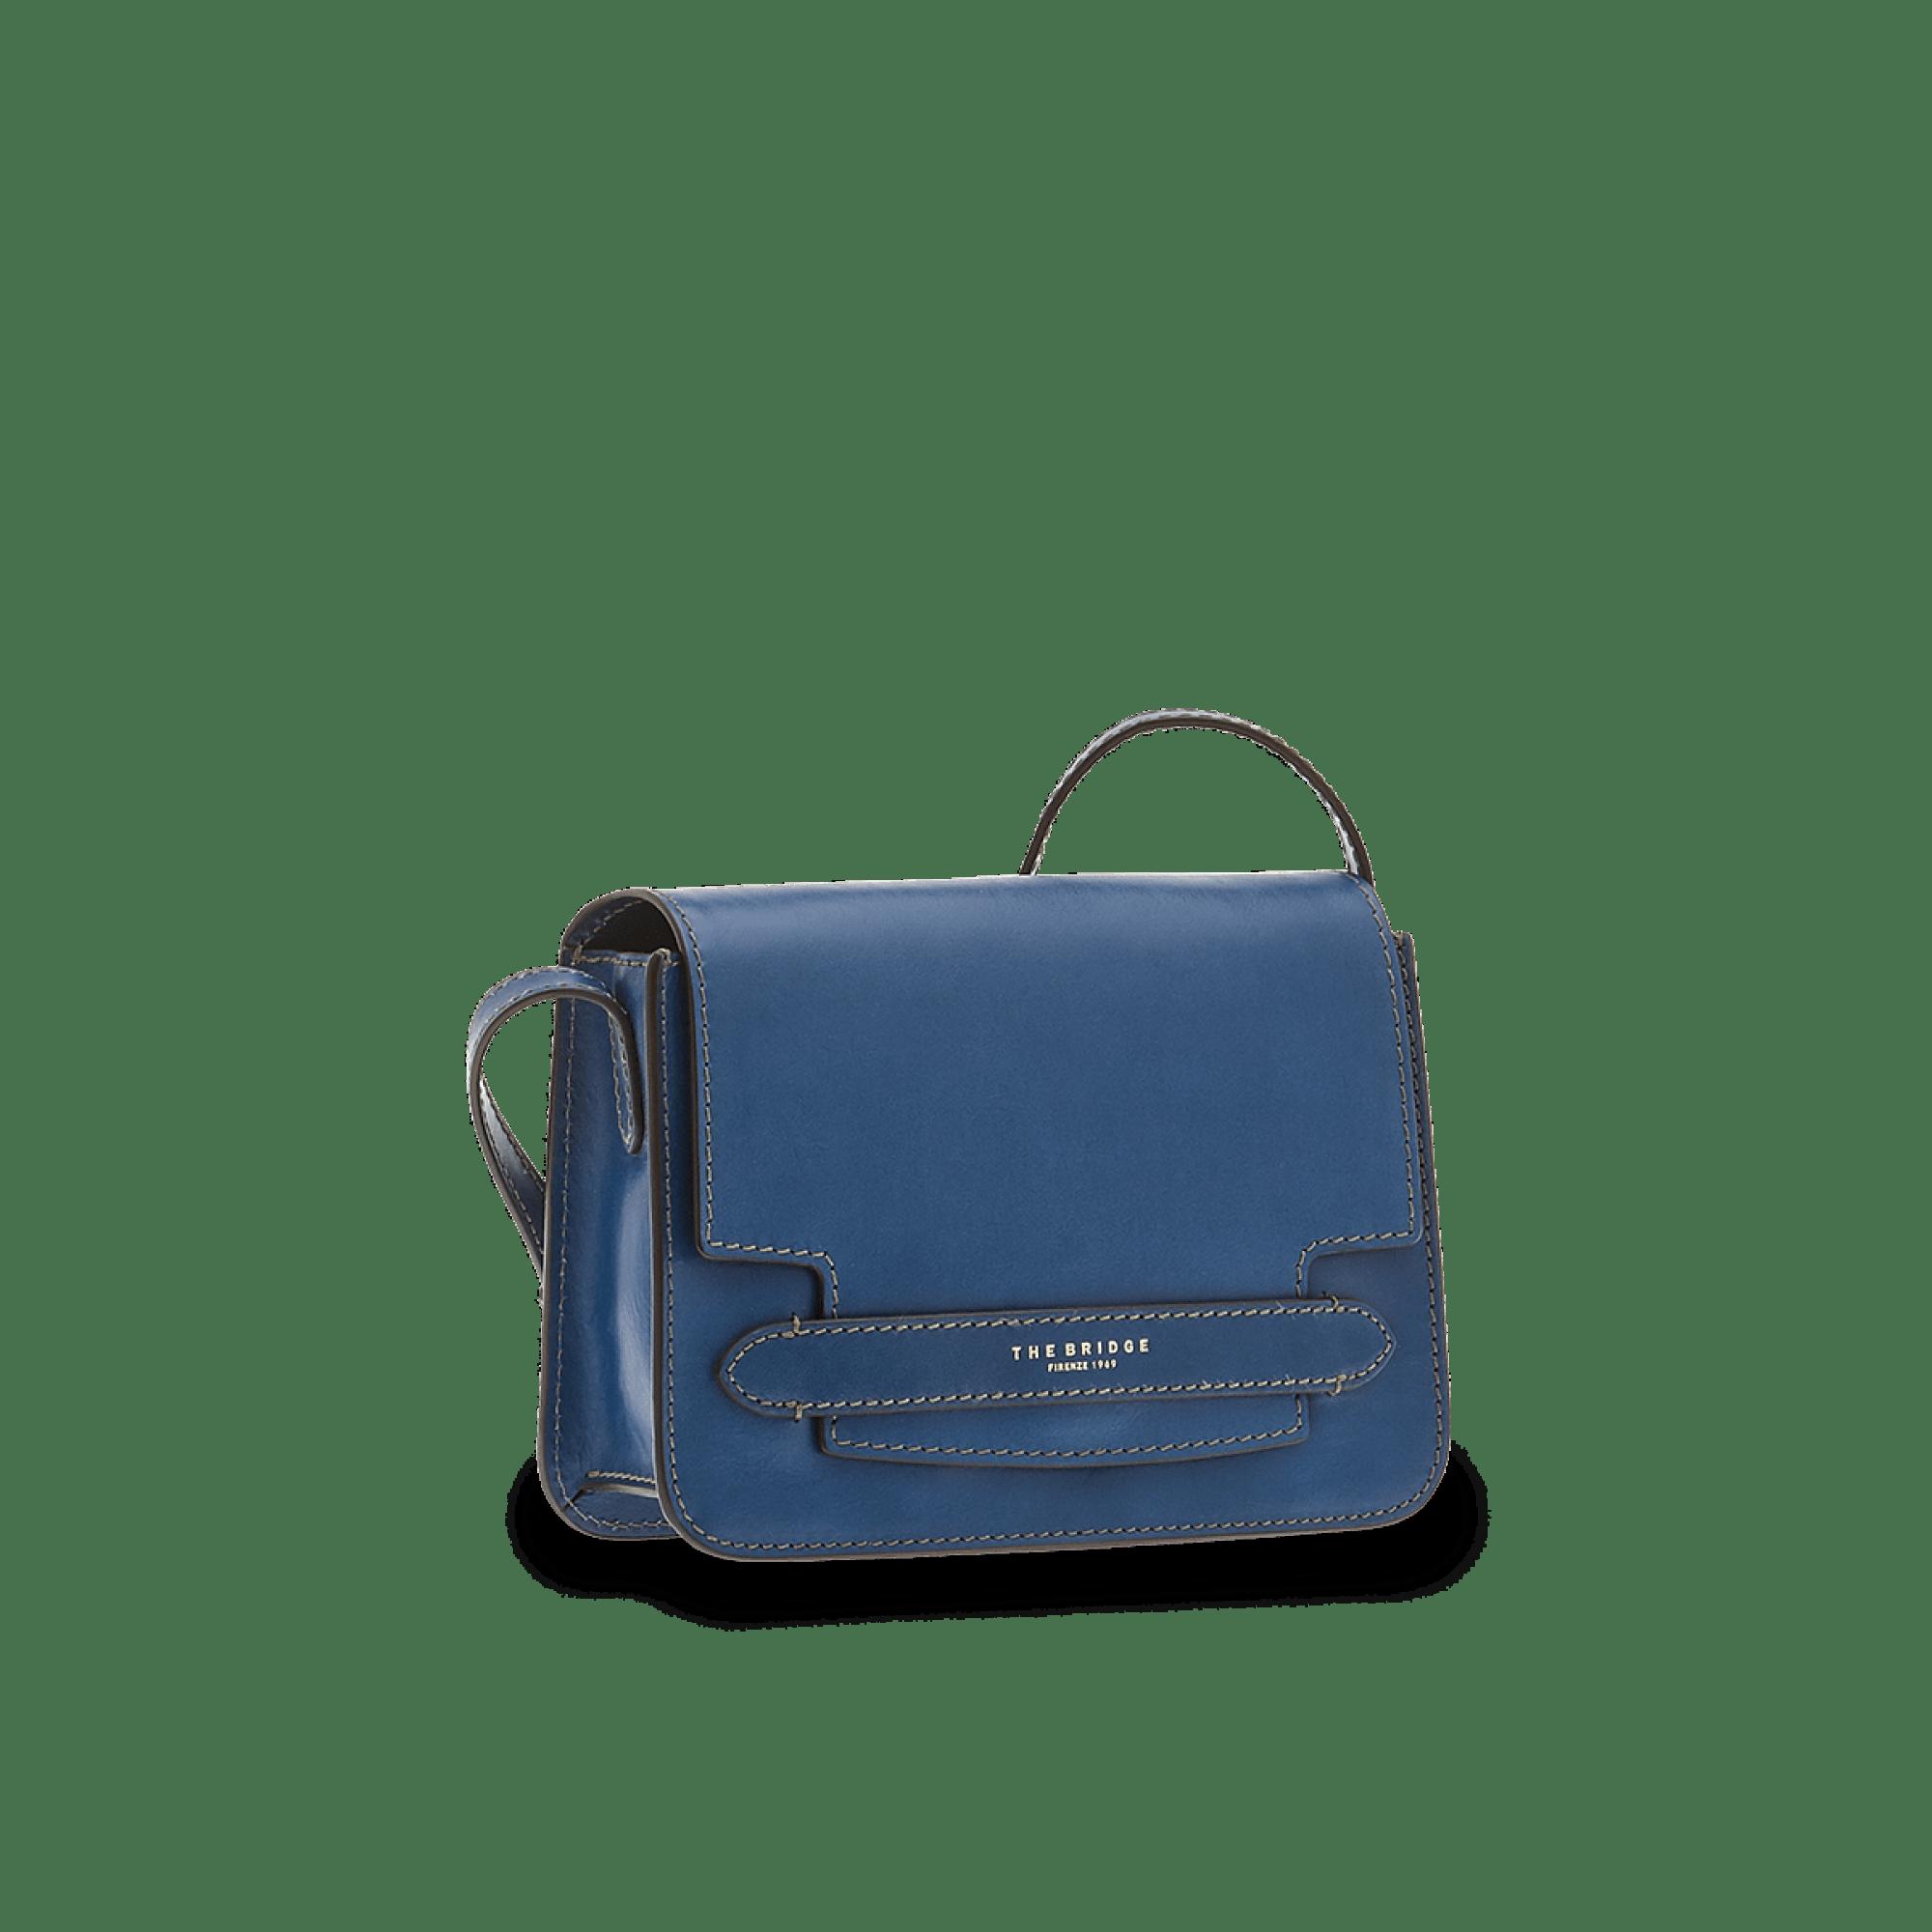 SHOULFER BAG